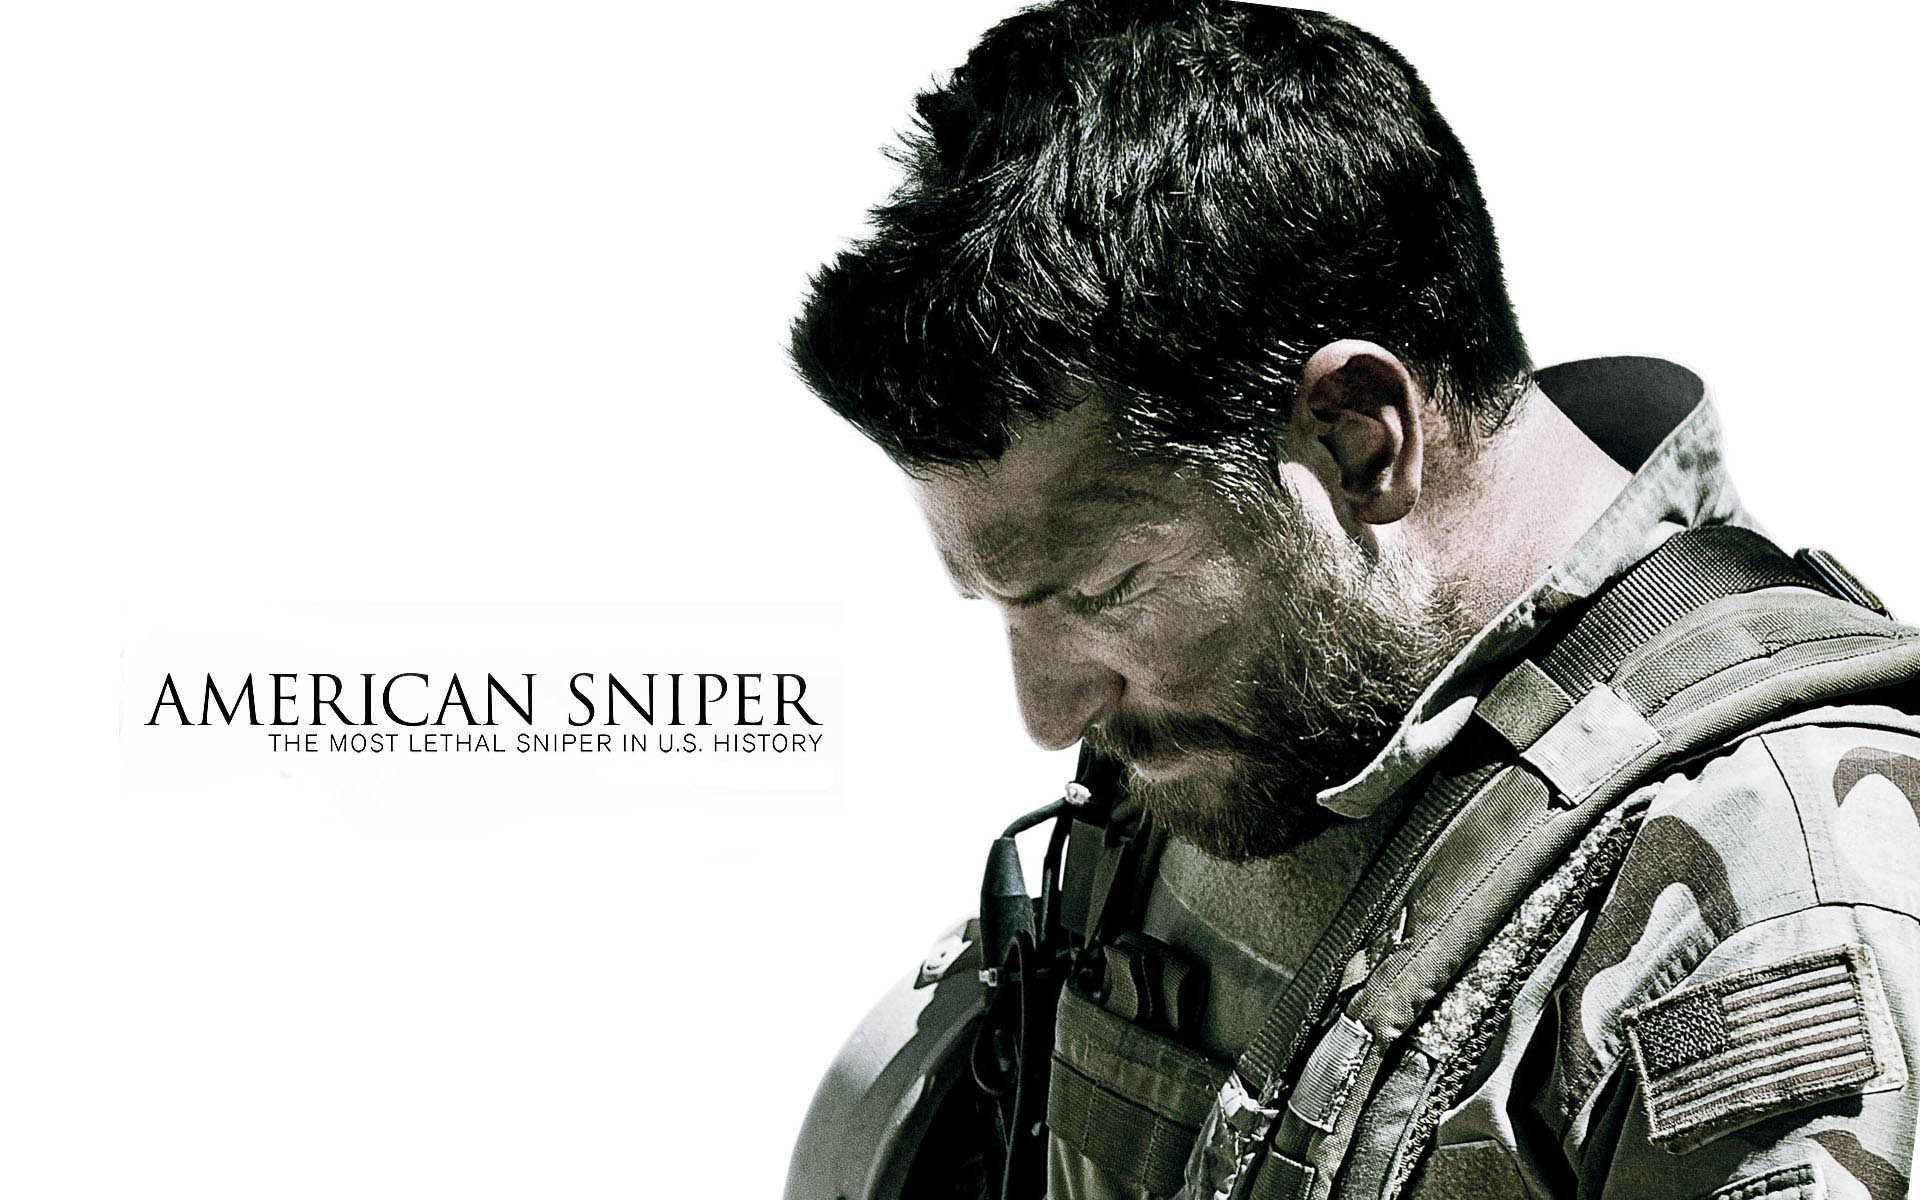 American Sniper Movie Poster 1920x1200